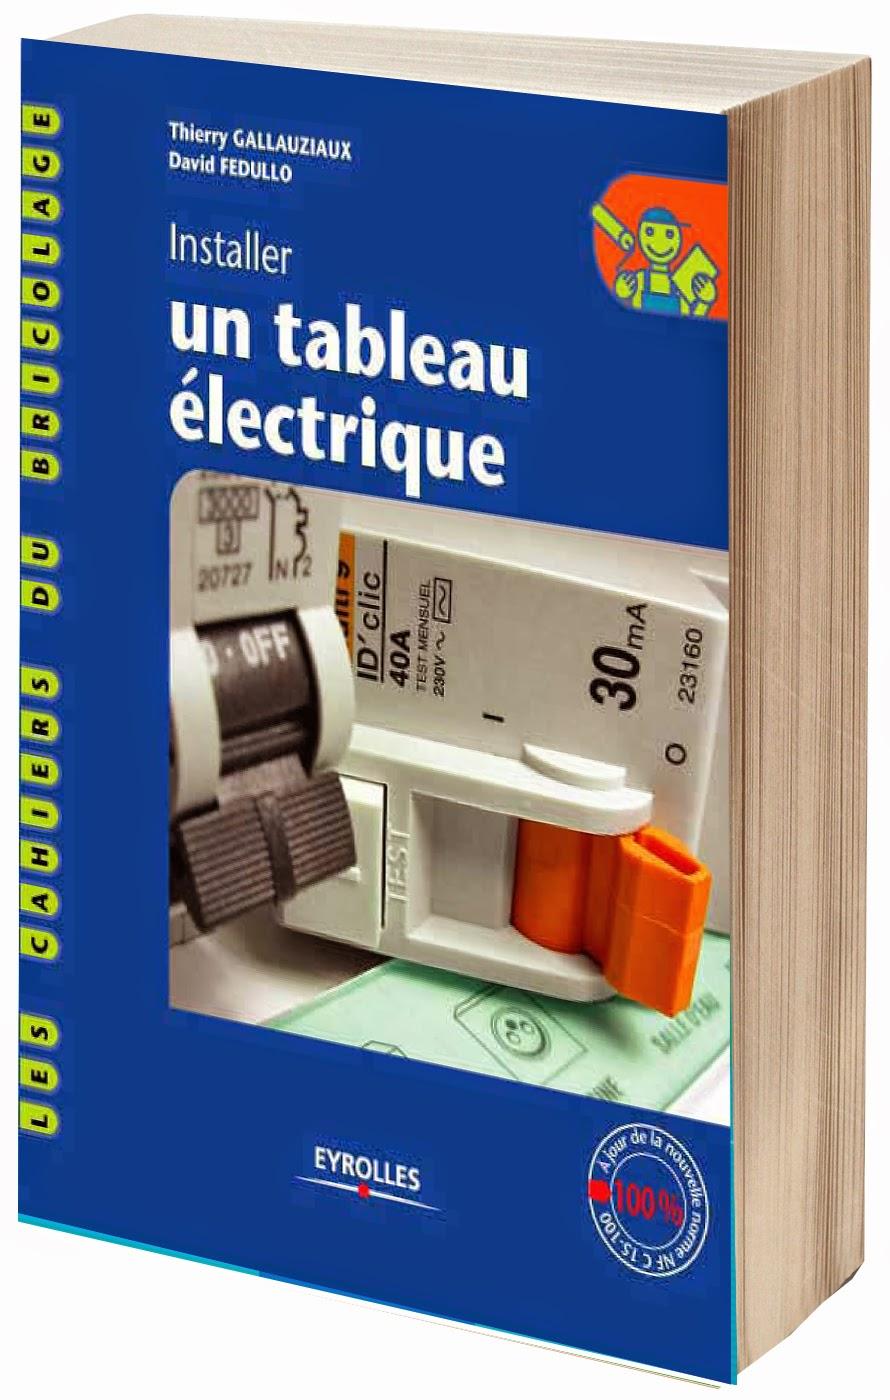 installer tableau electrique telecharger livre gratuit. Black Bedroom Furniture Sets. Home Design Ideas